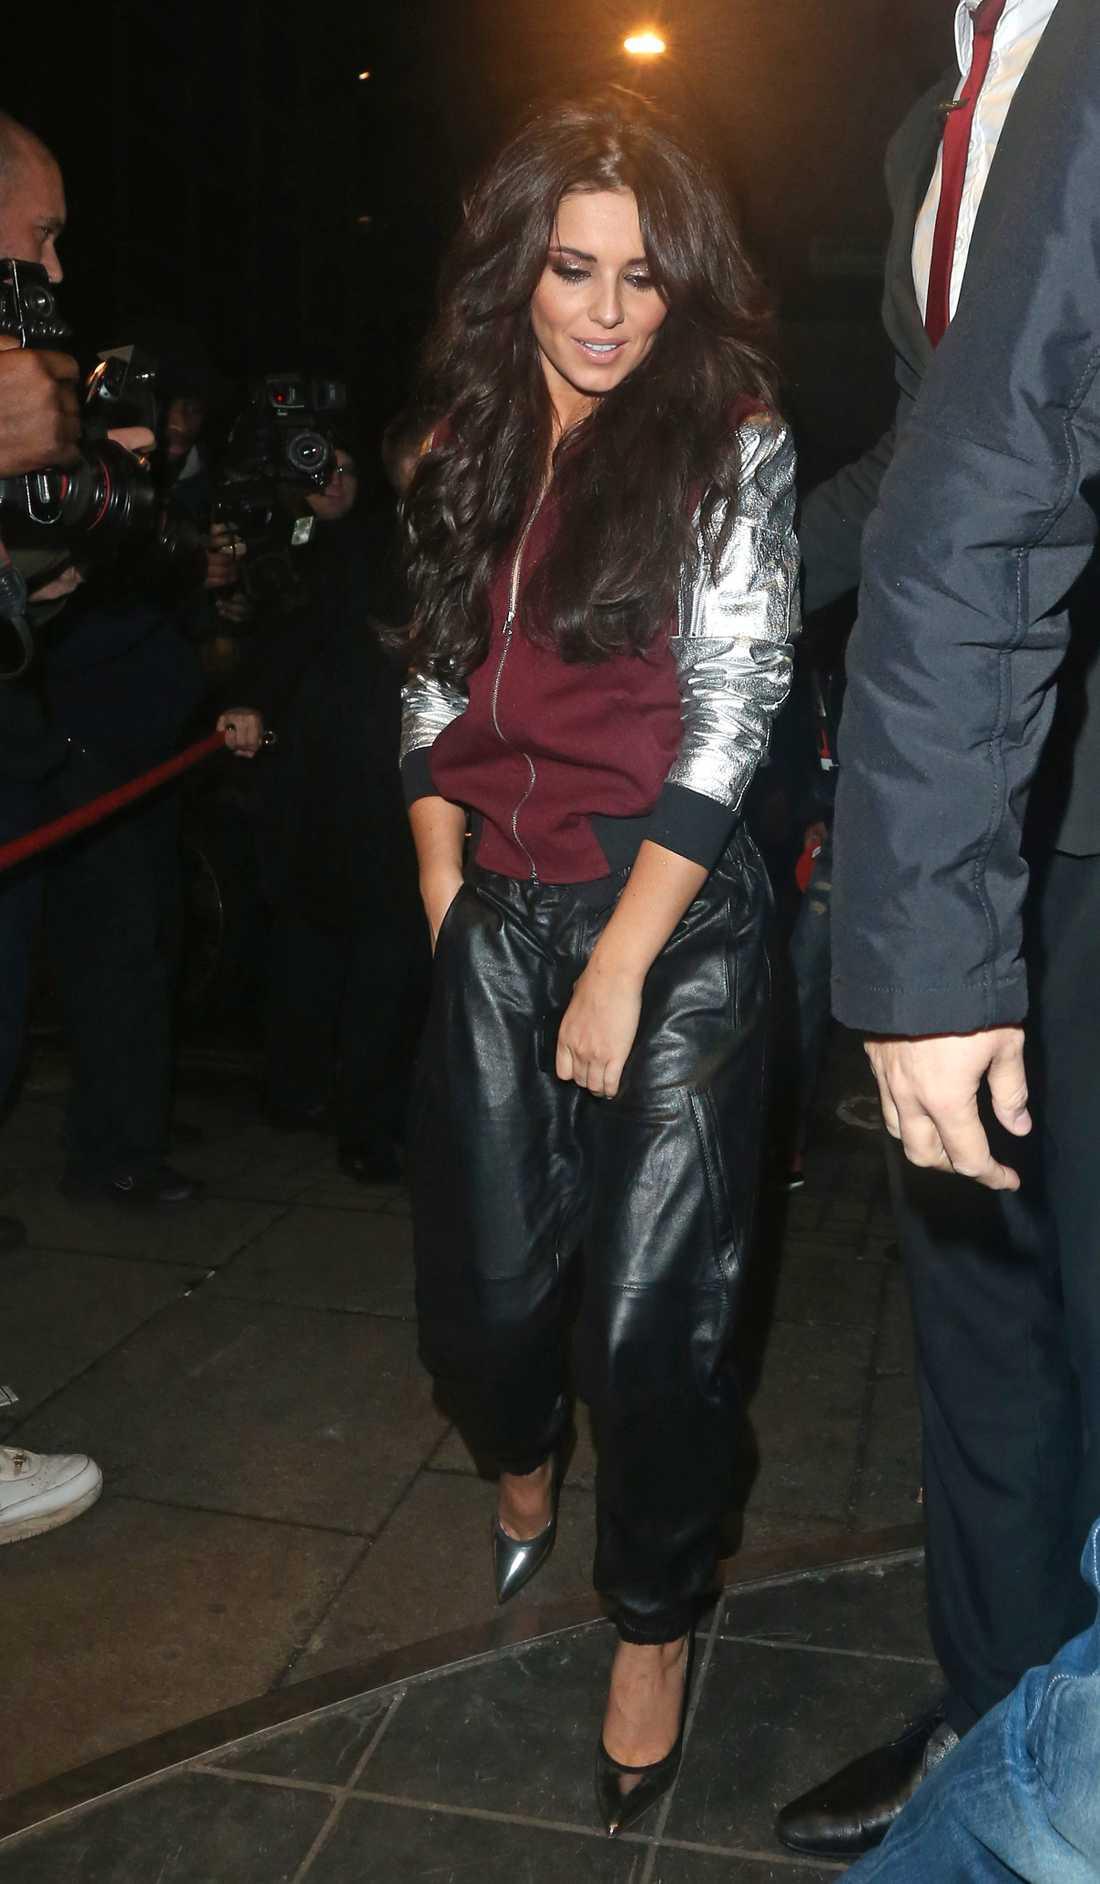 Cheryl Cole sportar oversizad skinnbyxa och silverdetaljer.